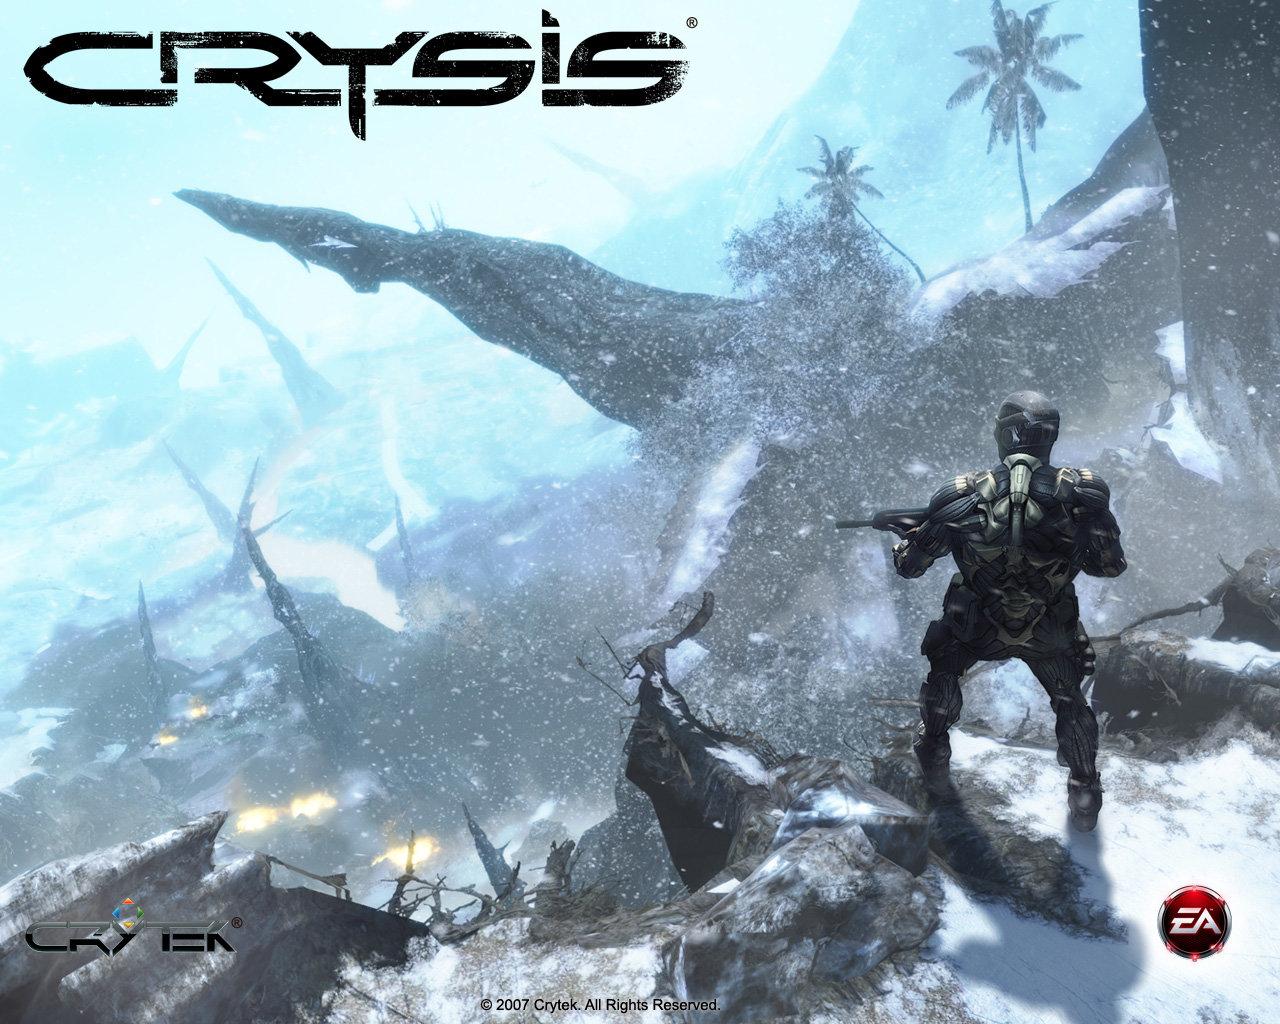 crysis wallpaper my image